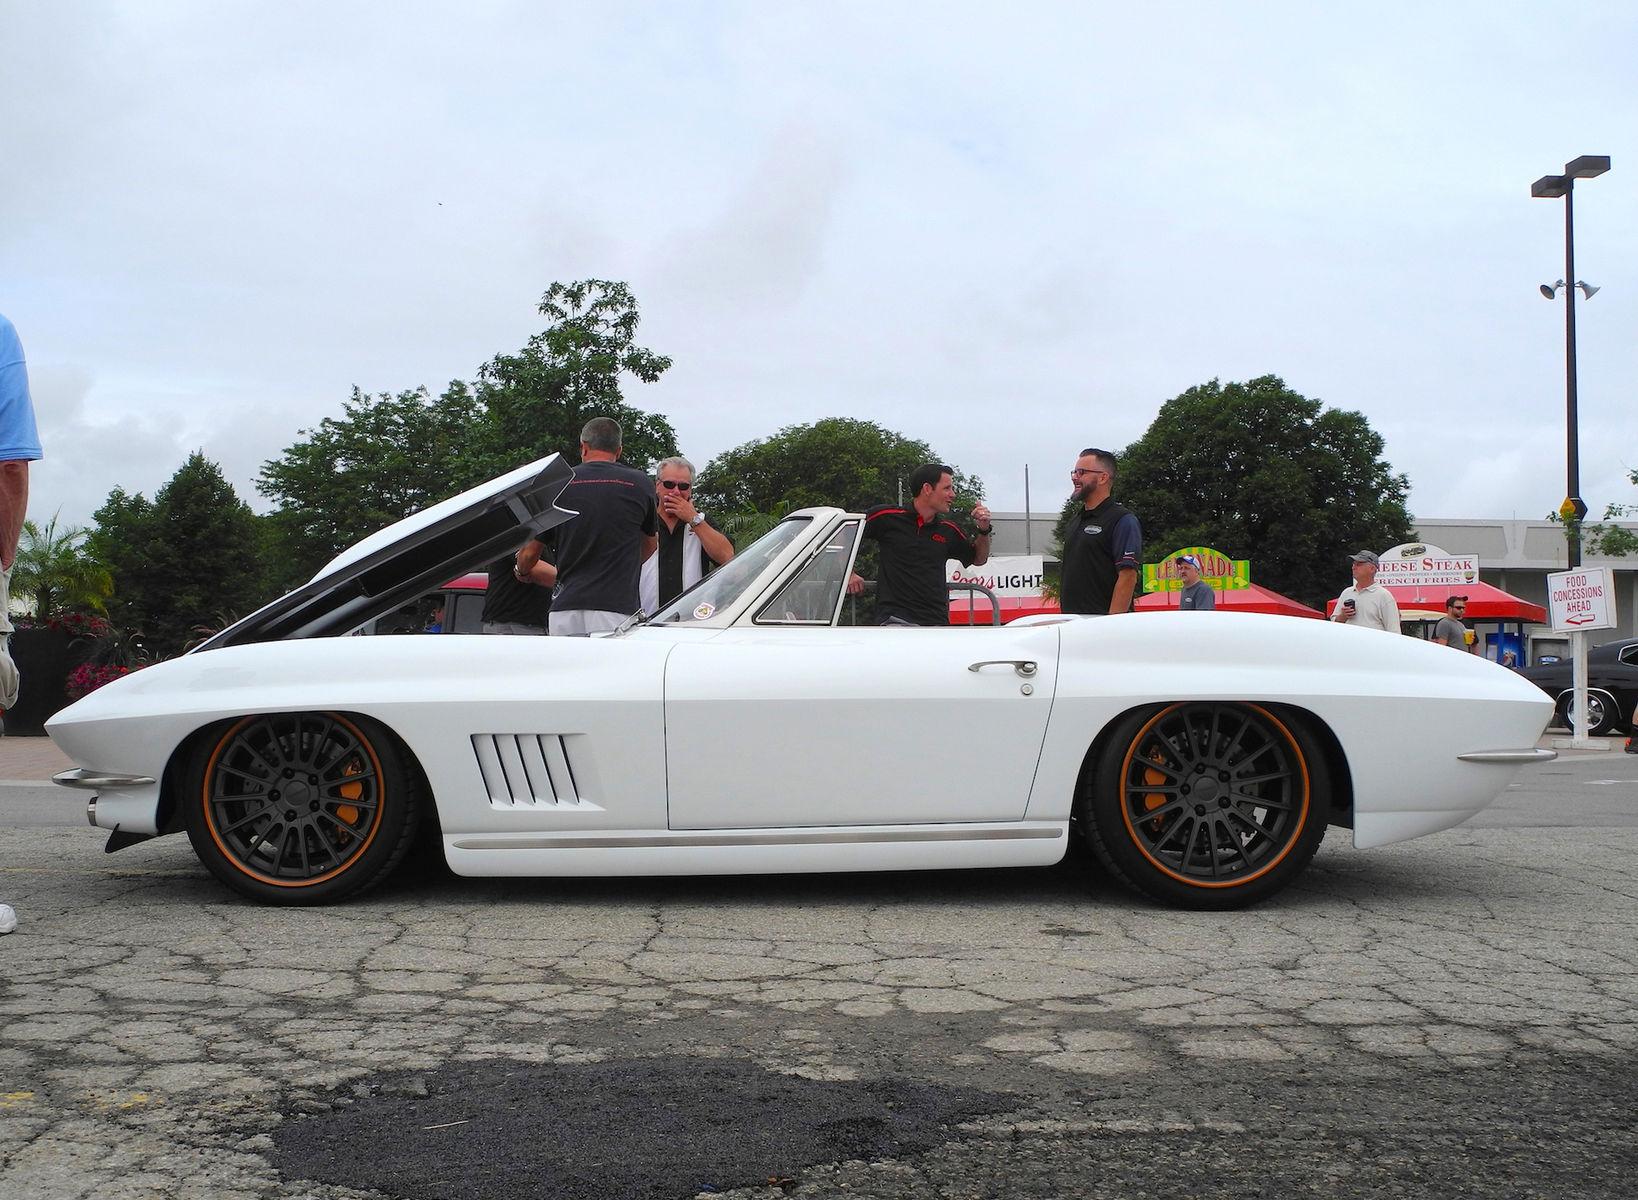 1967 Chevrolet Corvette | 2015 Street Machine of the Year